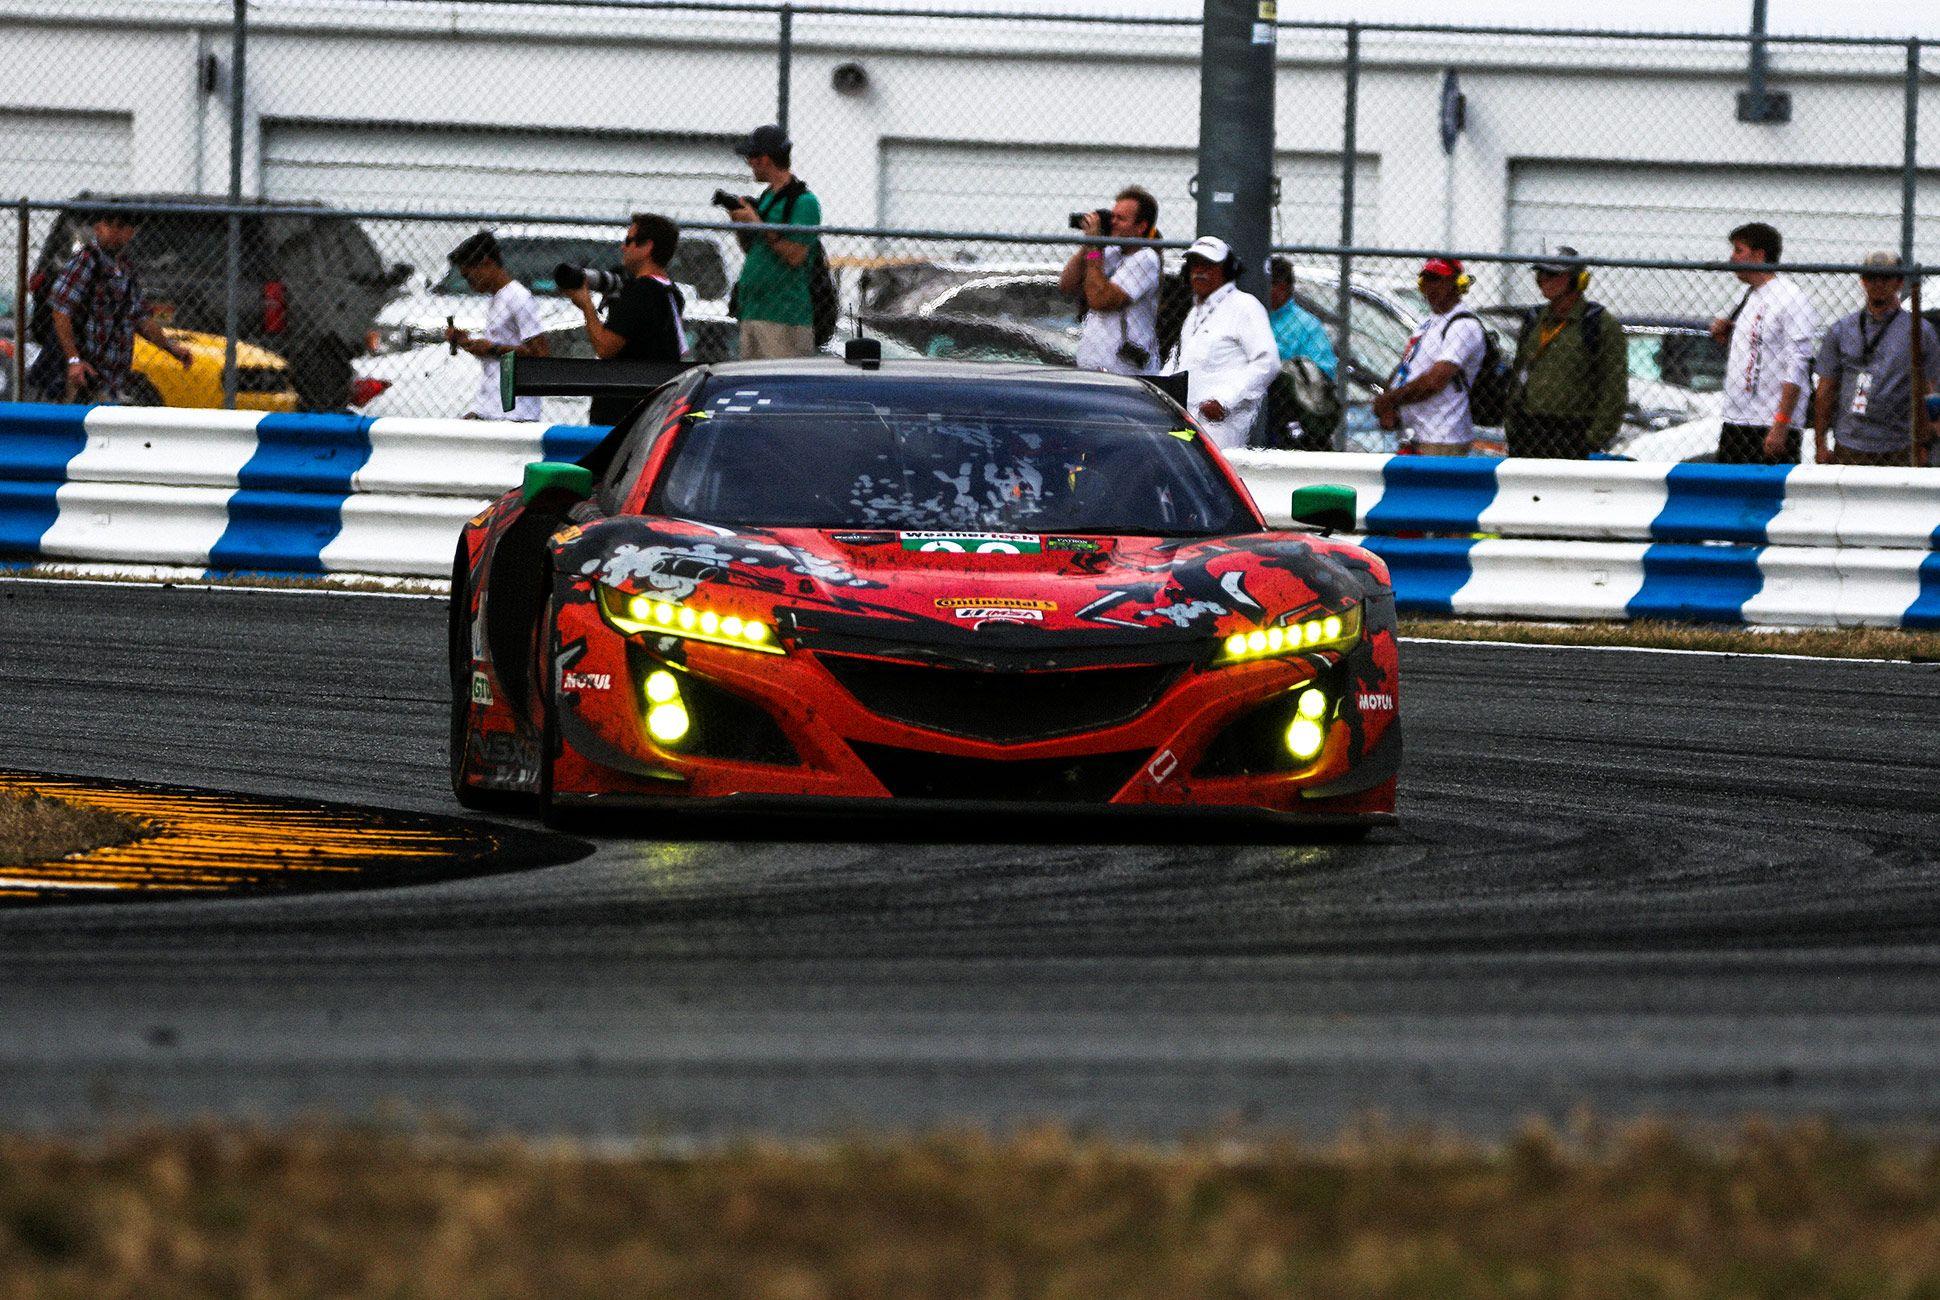 Best-Sports-Cars-of-2018-Daytona-24-Hours-gear-patrol-Acura-NSX-GT3-2